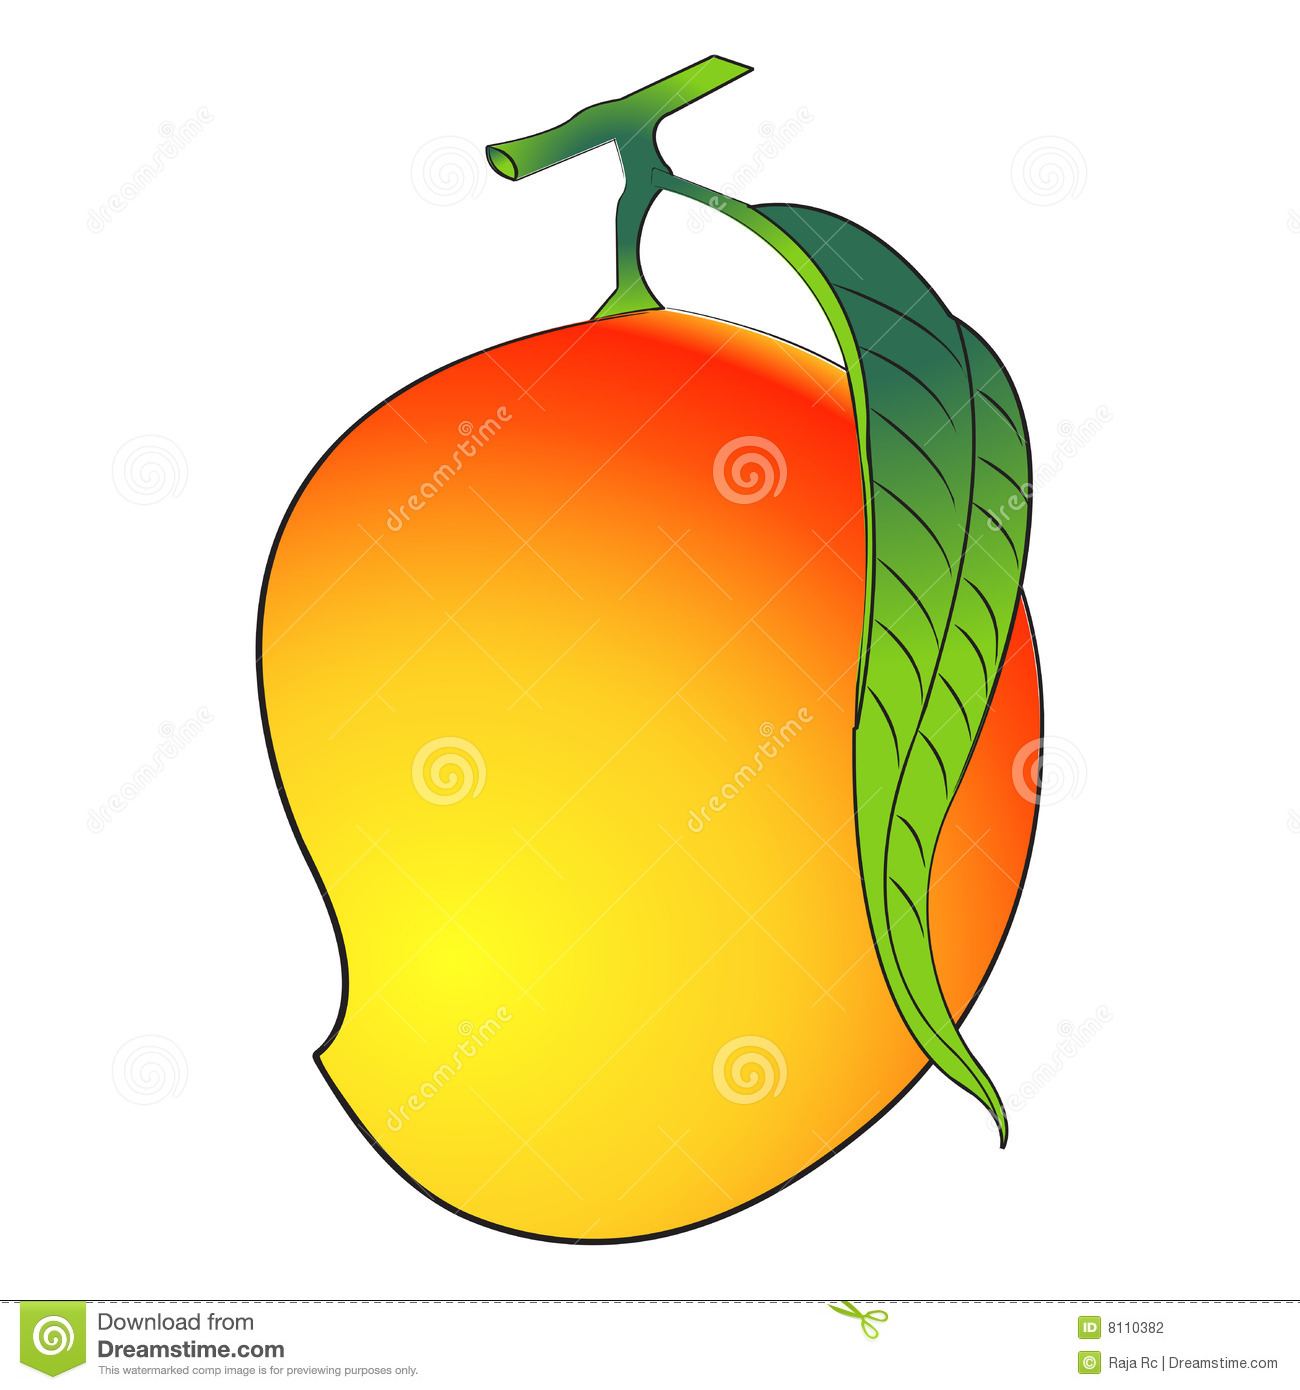 Mango Images Clip Art.